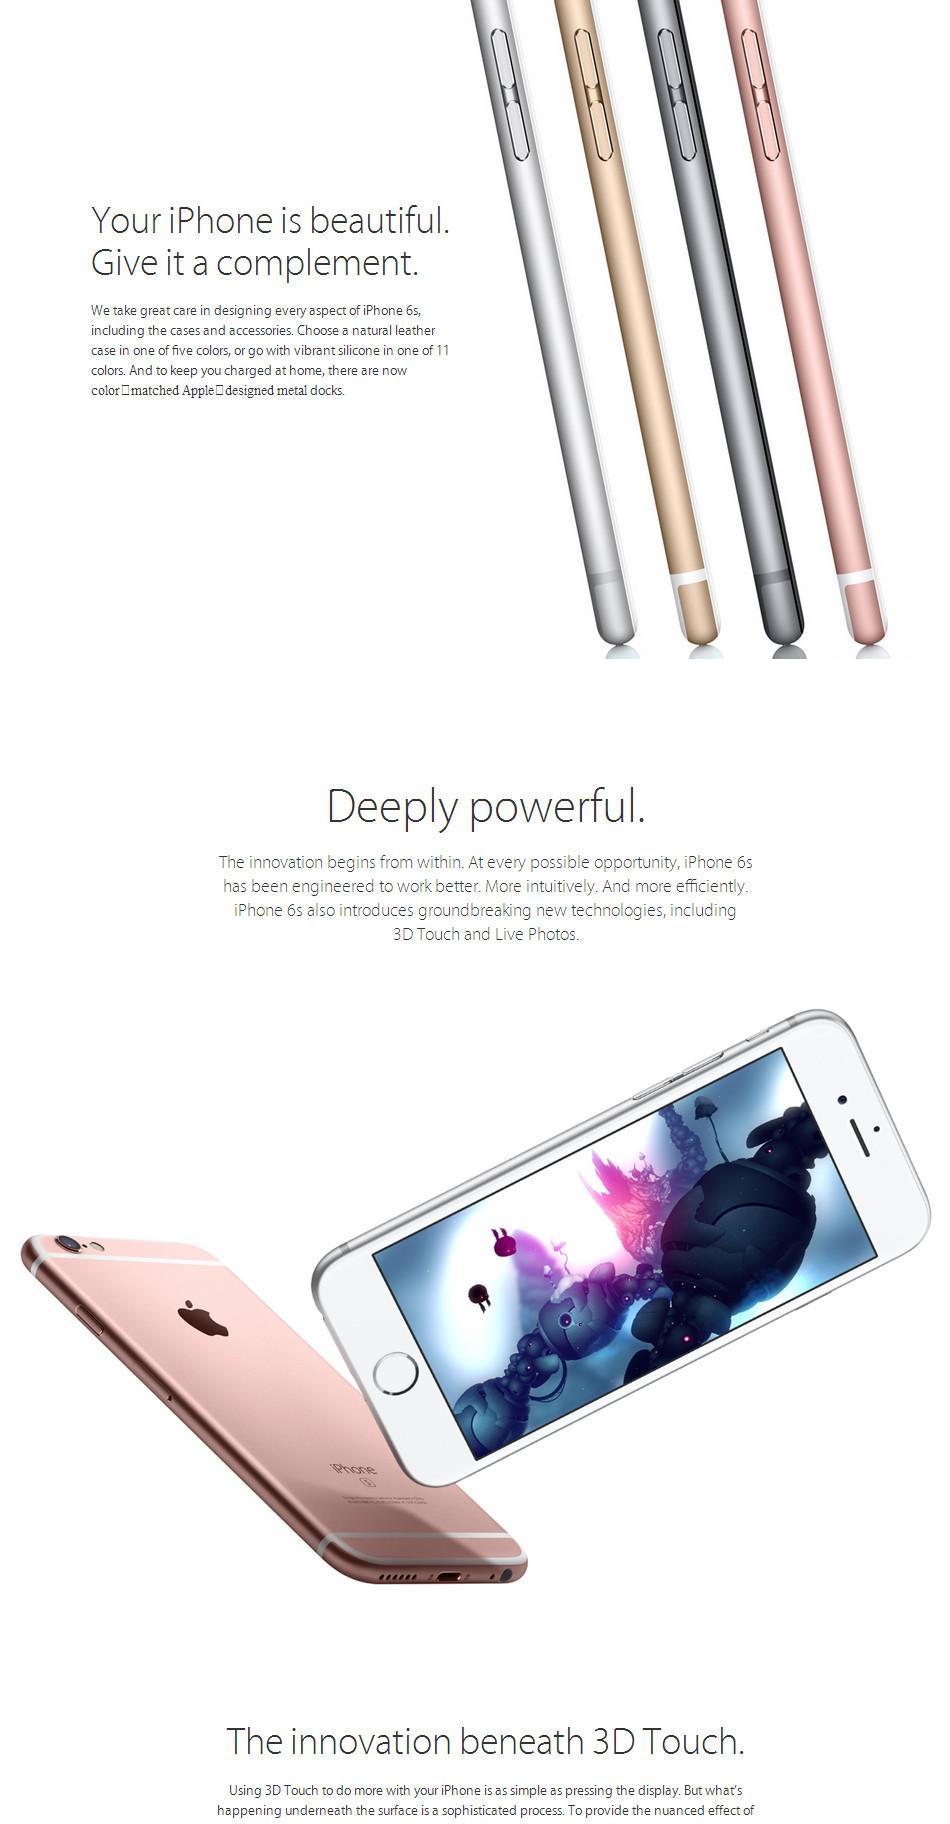 iPhone-6s_09